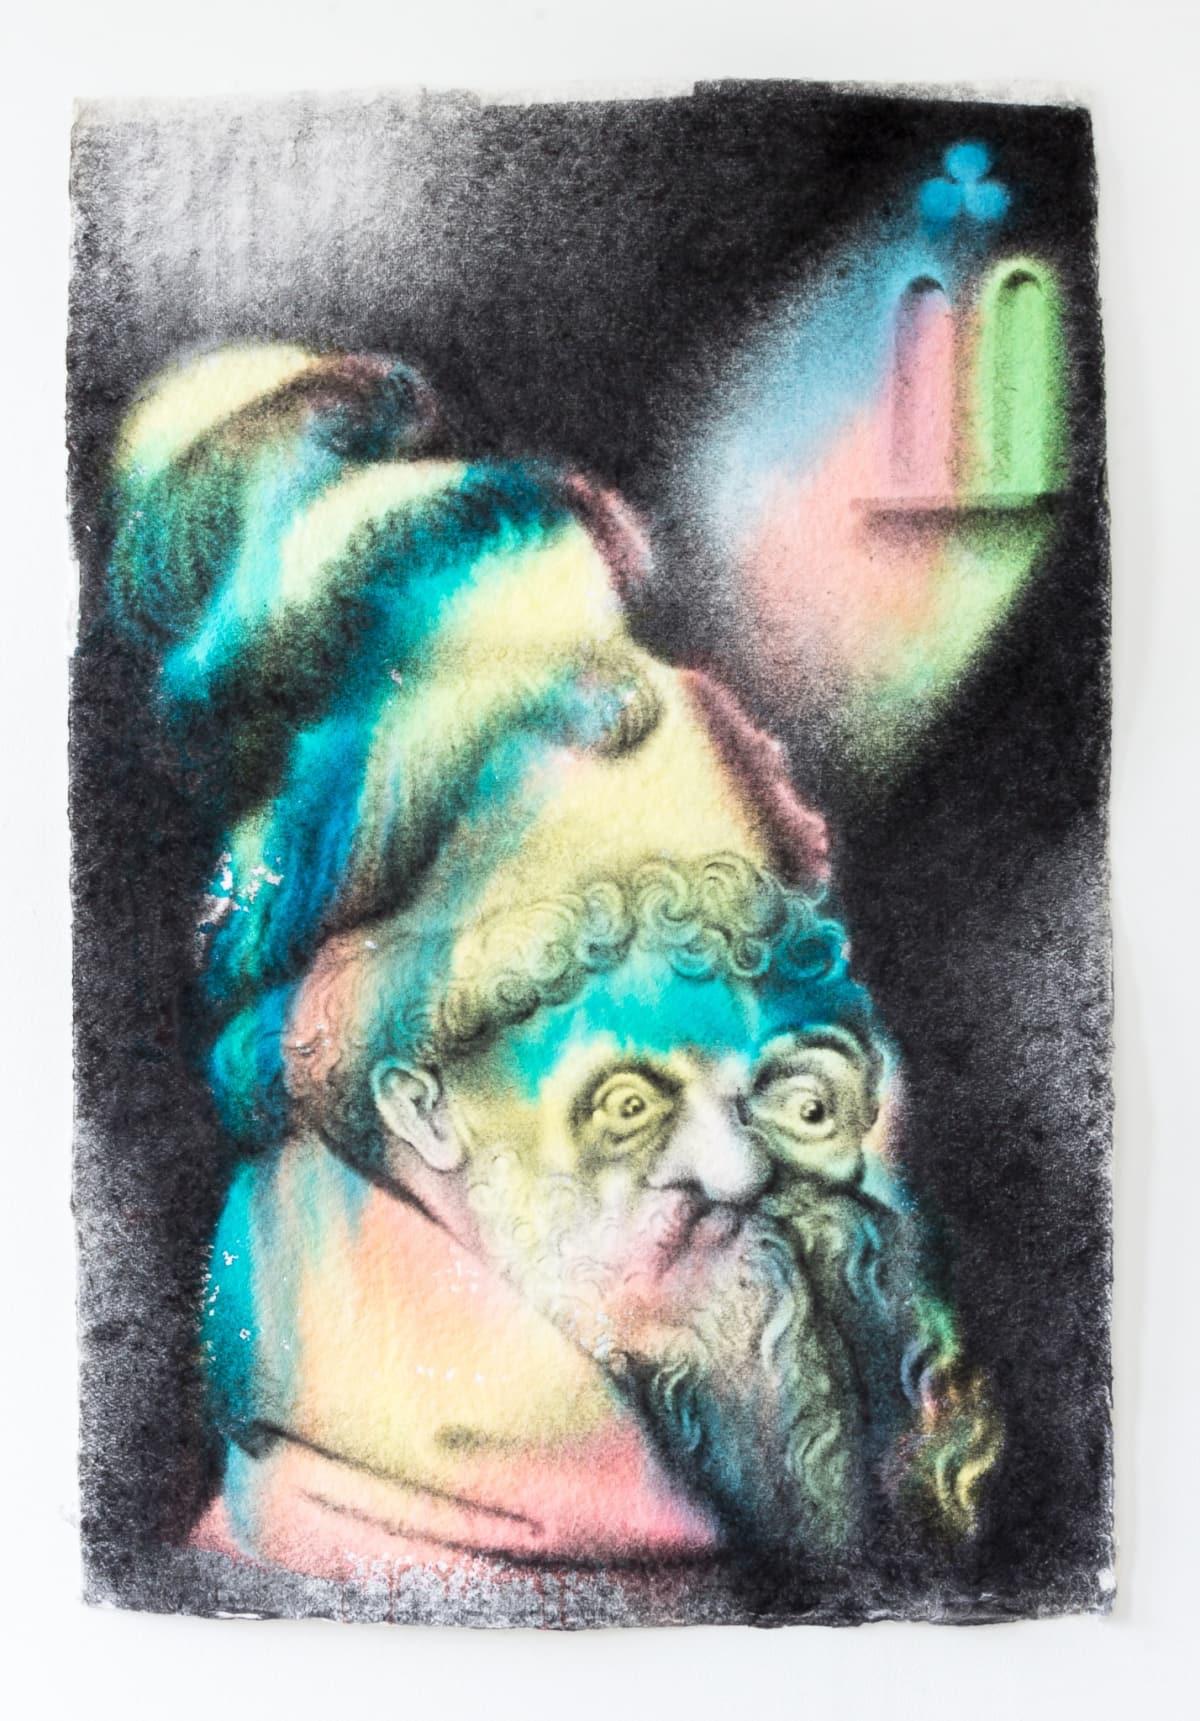 Robert McNally  Roger Bacon, 2017  Graphite powder & watercolour on handmade 1200g paper  101.9 x 68.5 cm  40 1/8 x 27 in